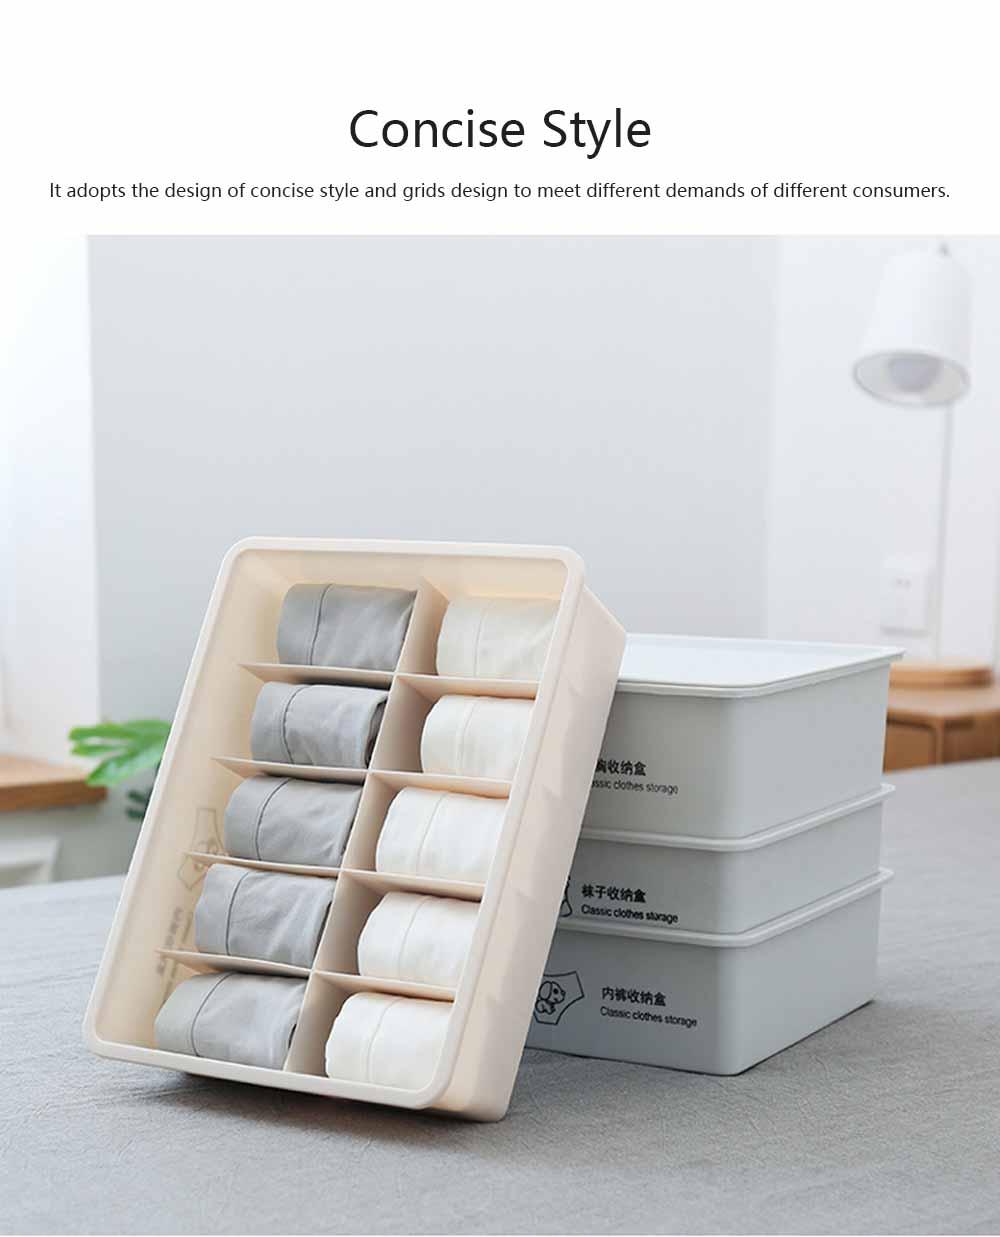 Compartmentalized Storage Boxes Higher Bottom Sunken Design Concise Style Underwear Bra and Socks Storage Cases 1